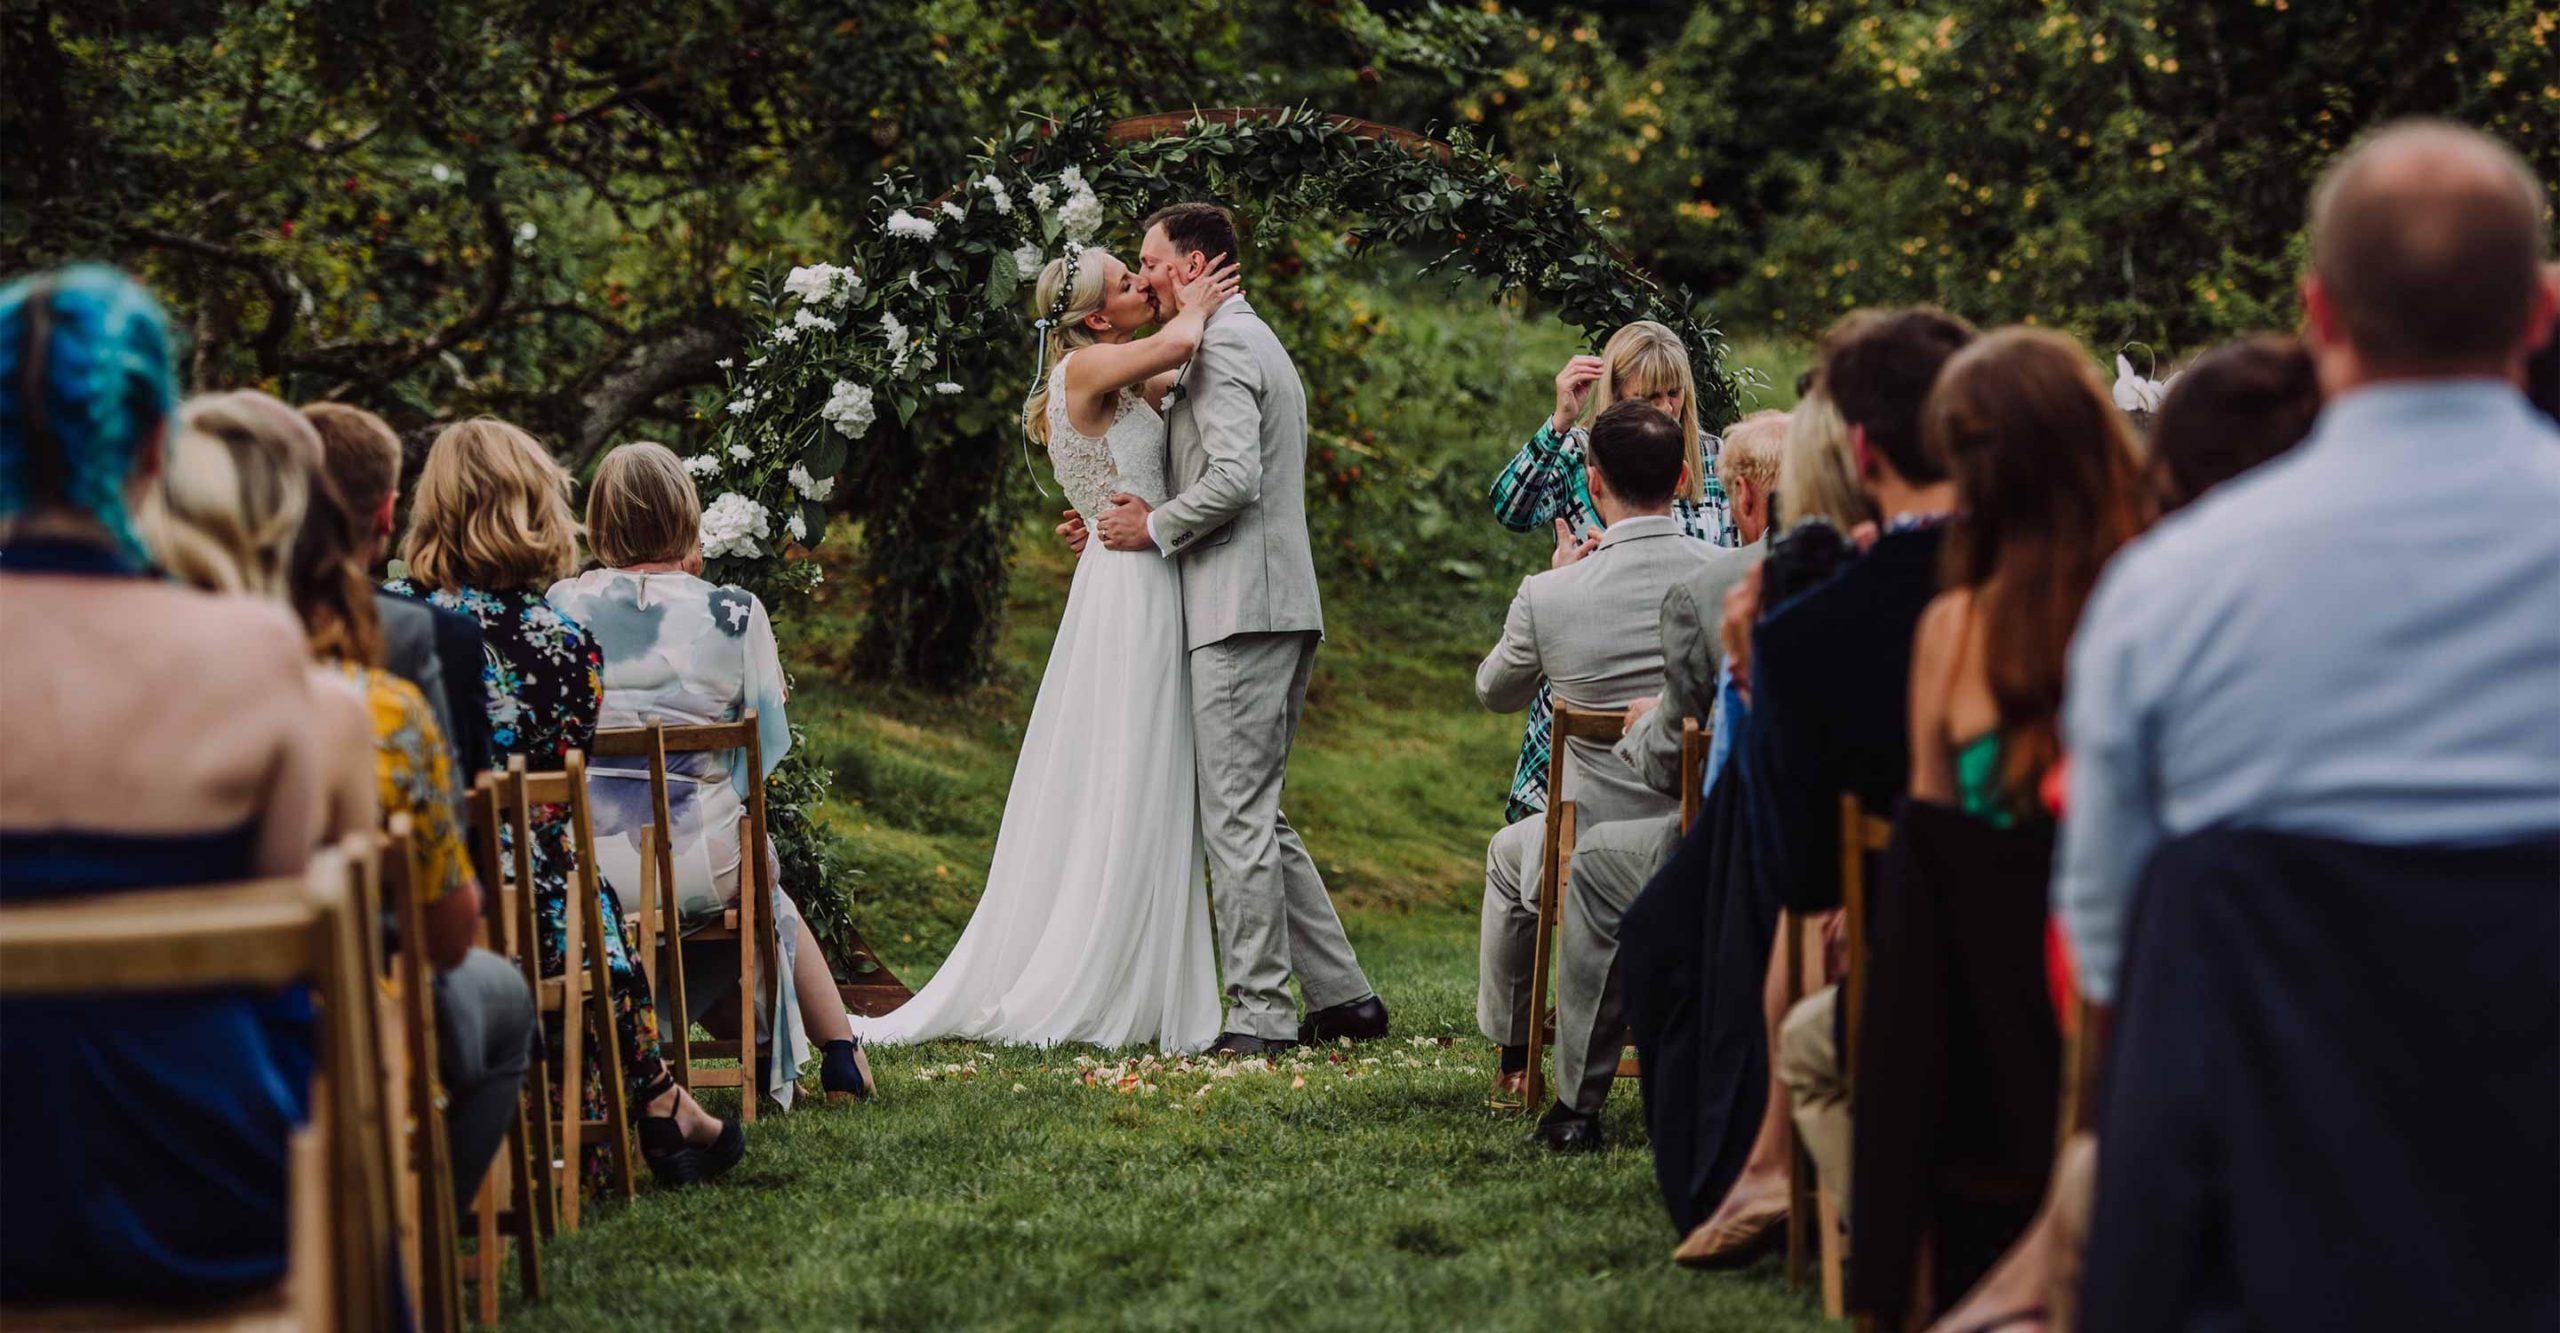 anran wedding photographer, bride and groom first kiss outside wedding, anran wedding devon, anran wedding, devon documentary wedding photographer